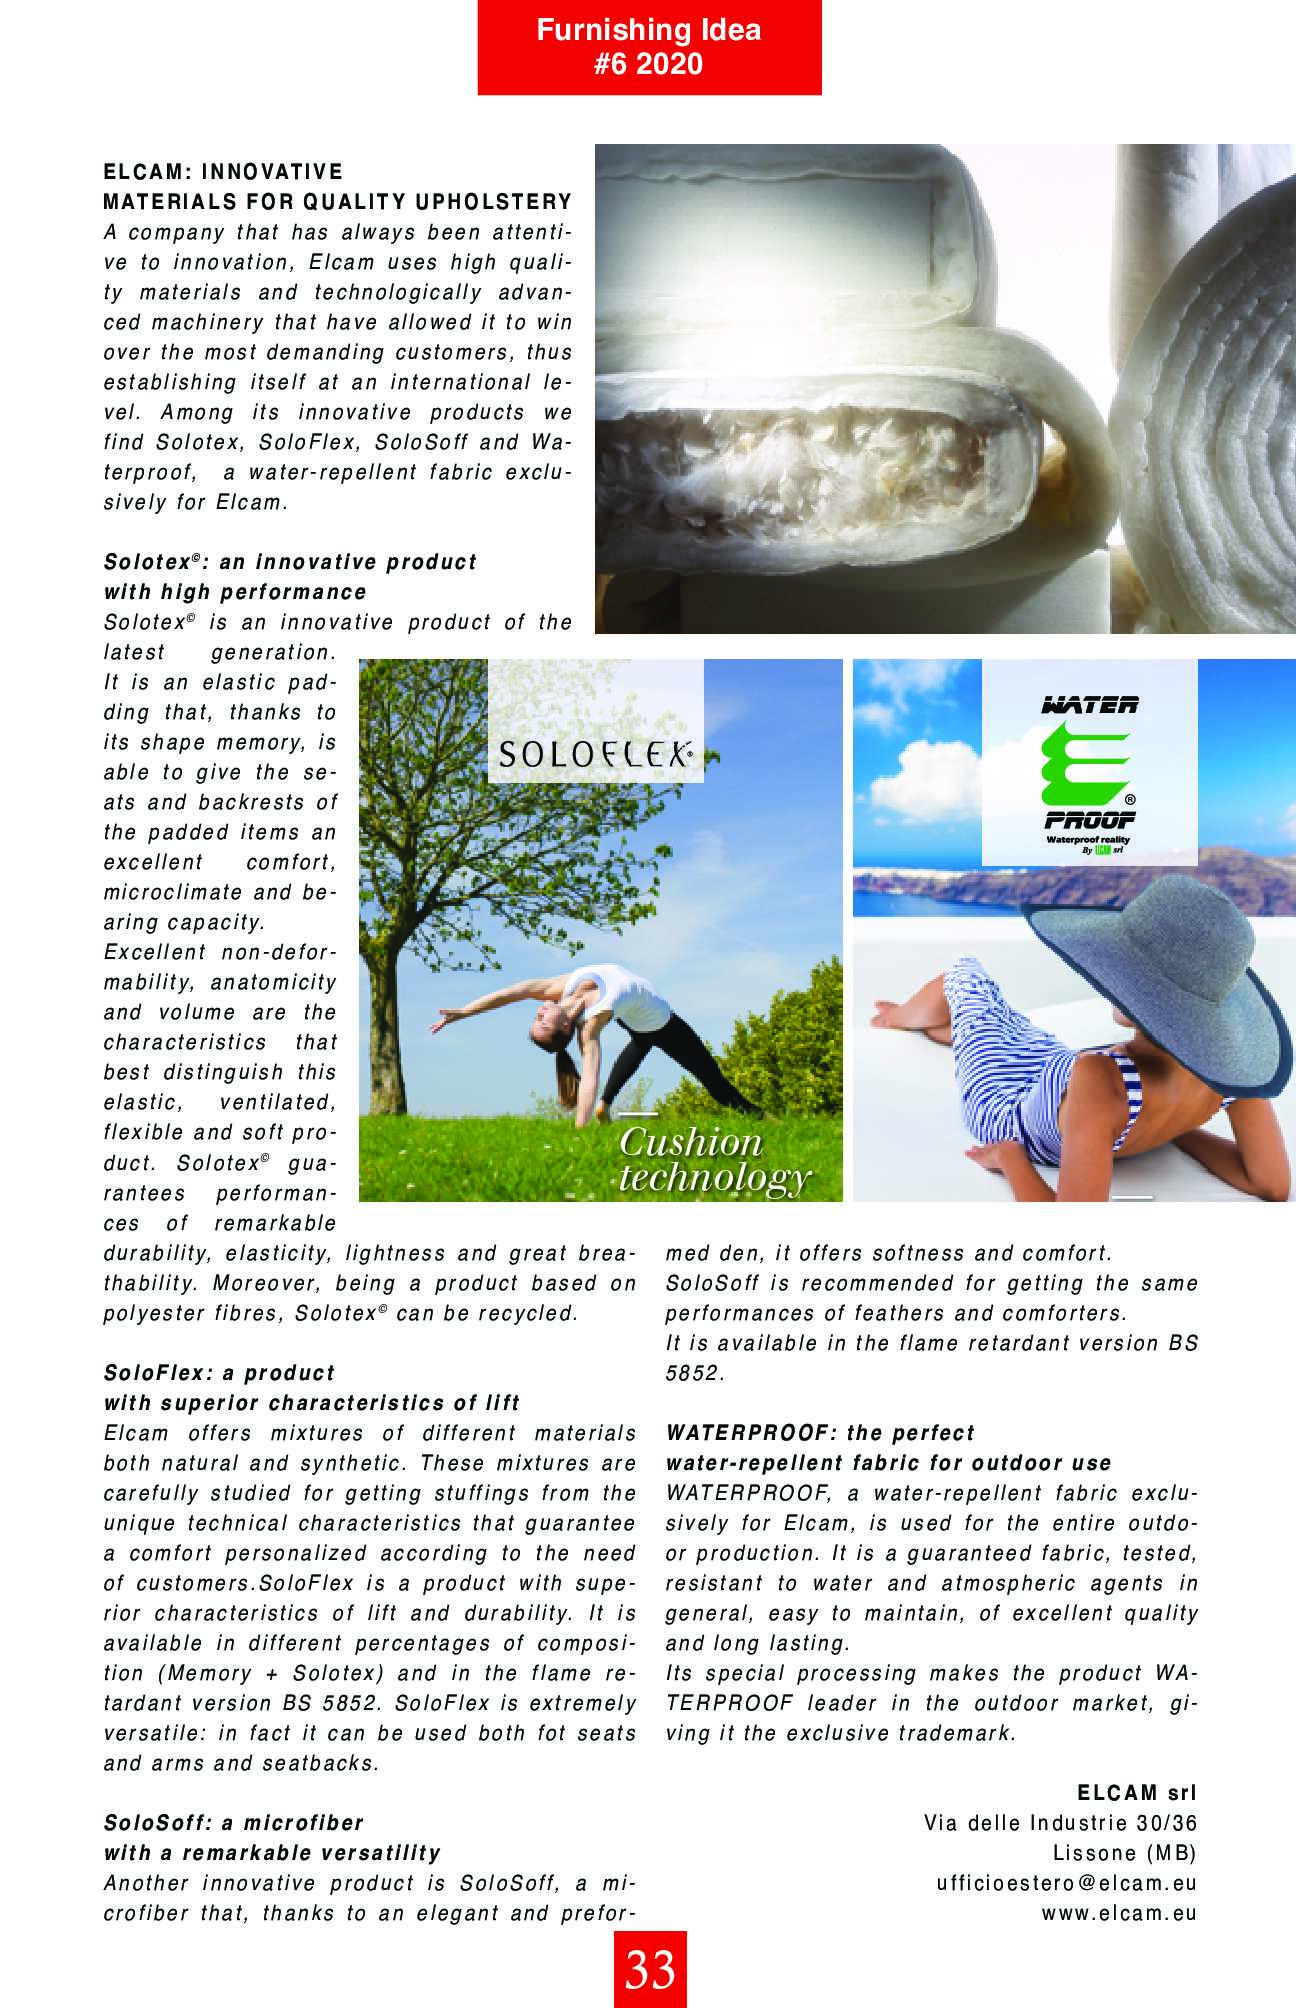 furnishingidea-6-2020_journal_22_032.jpg